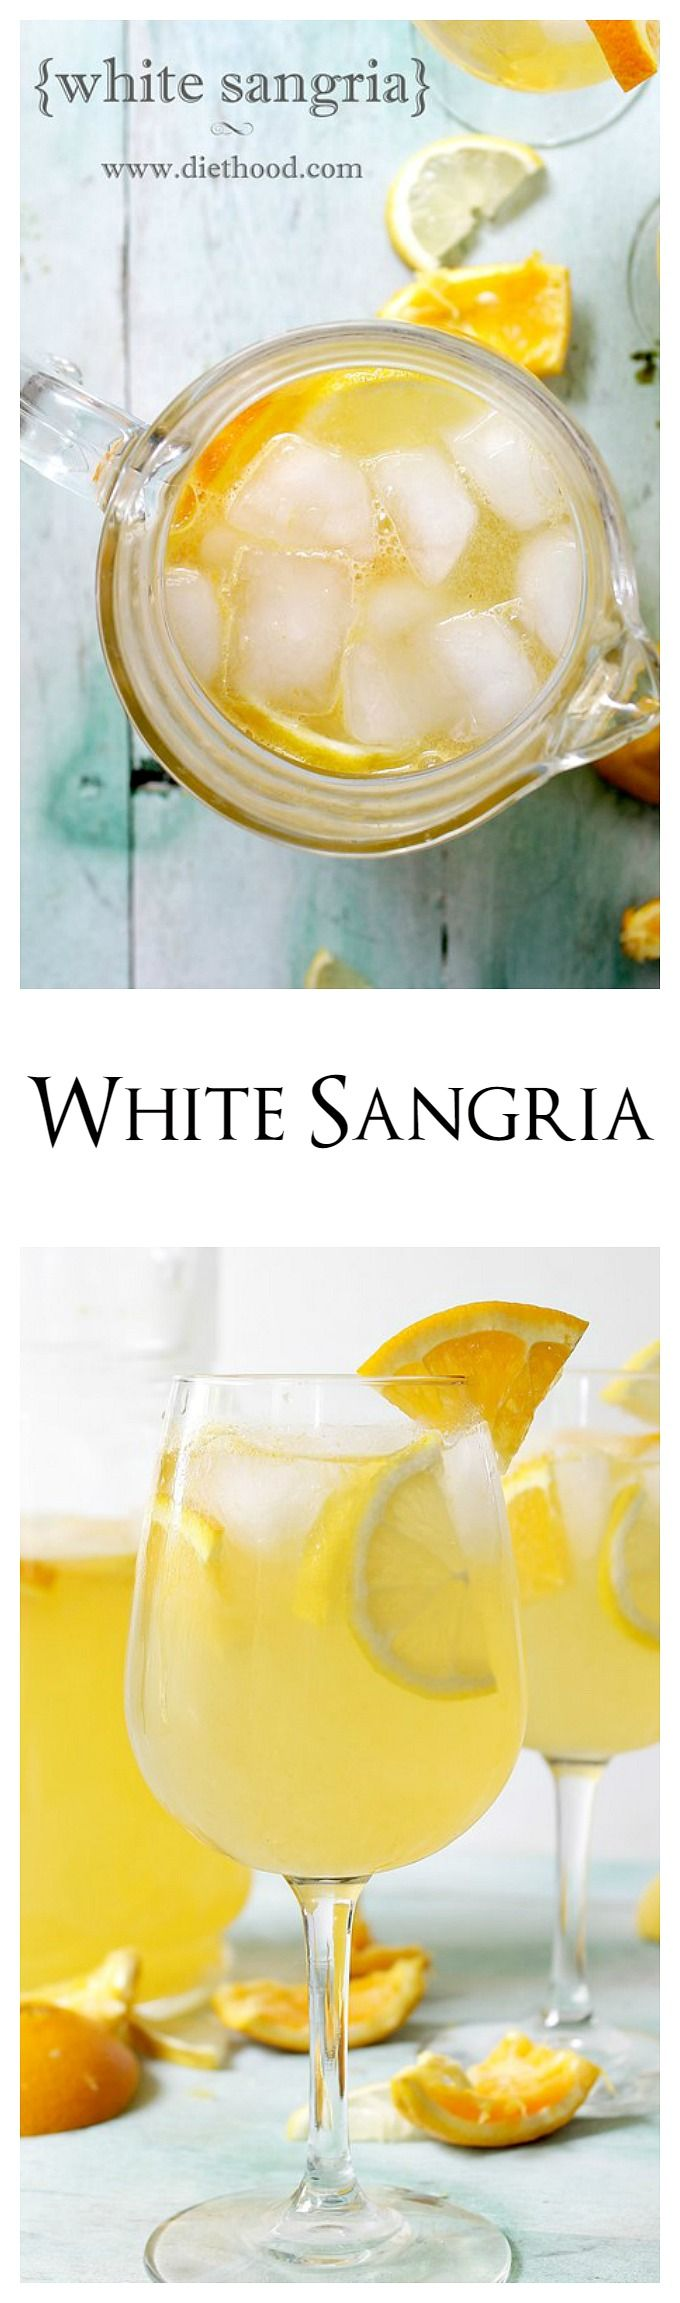 Fresh and fruity White Sangria made with white wine, triple sec, fresh orange juice and lemon juice.